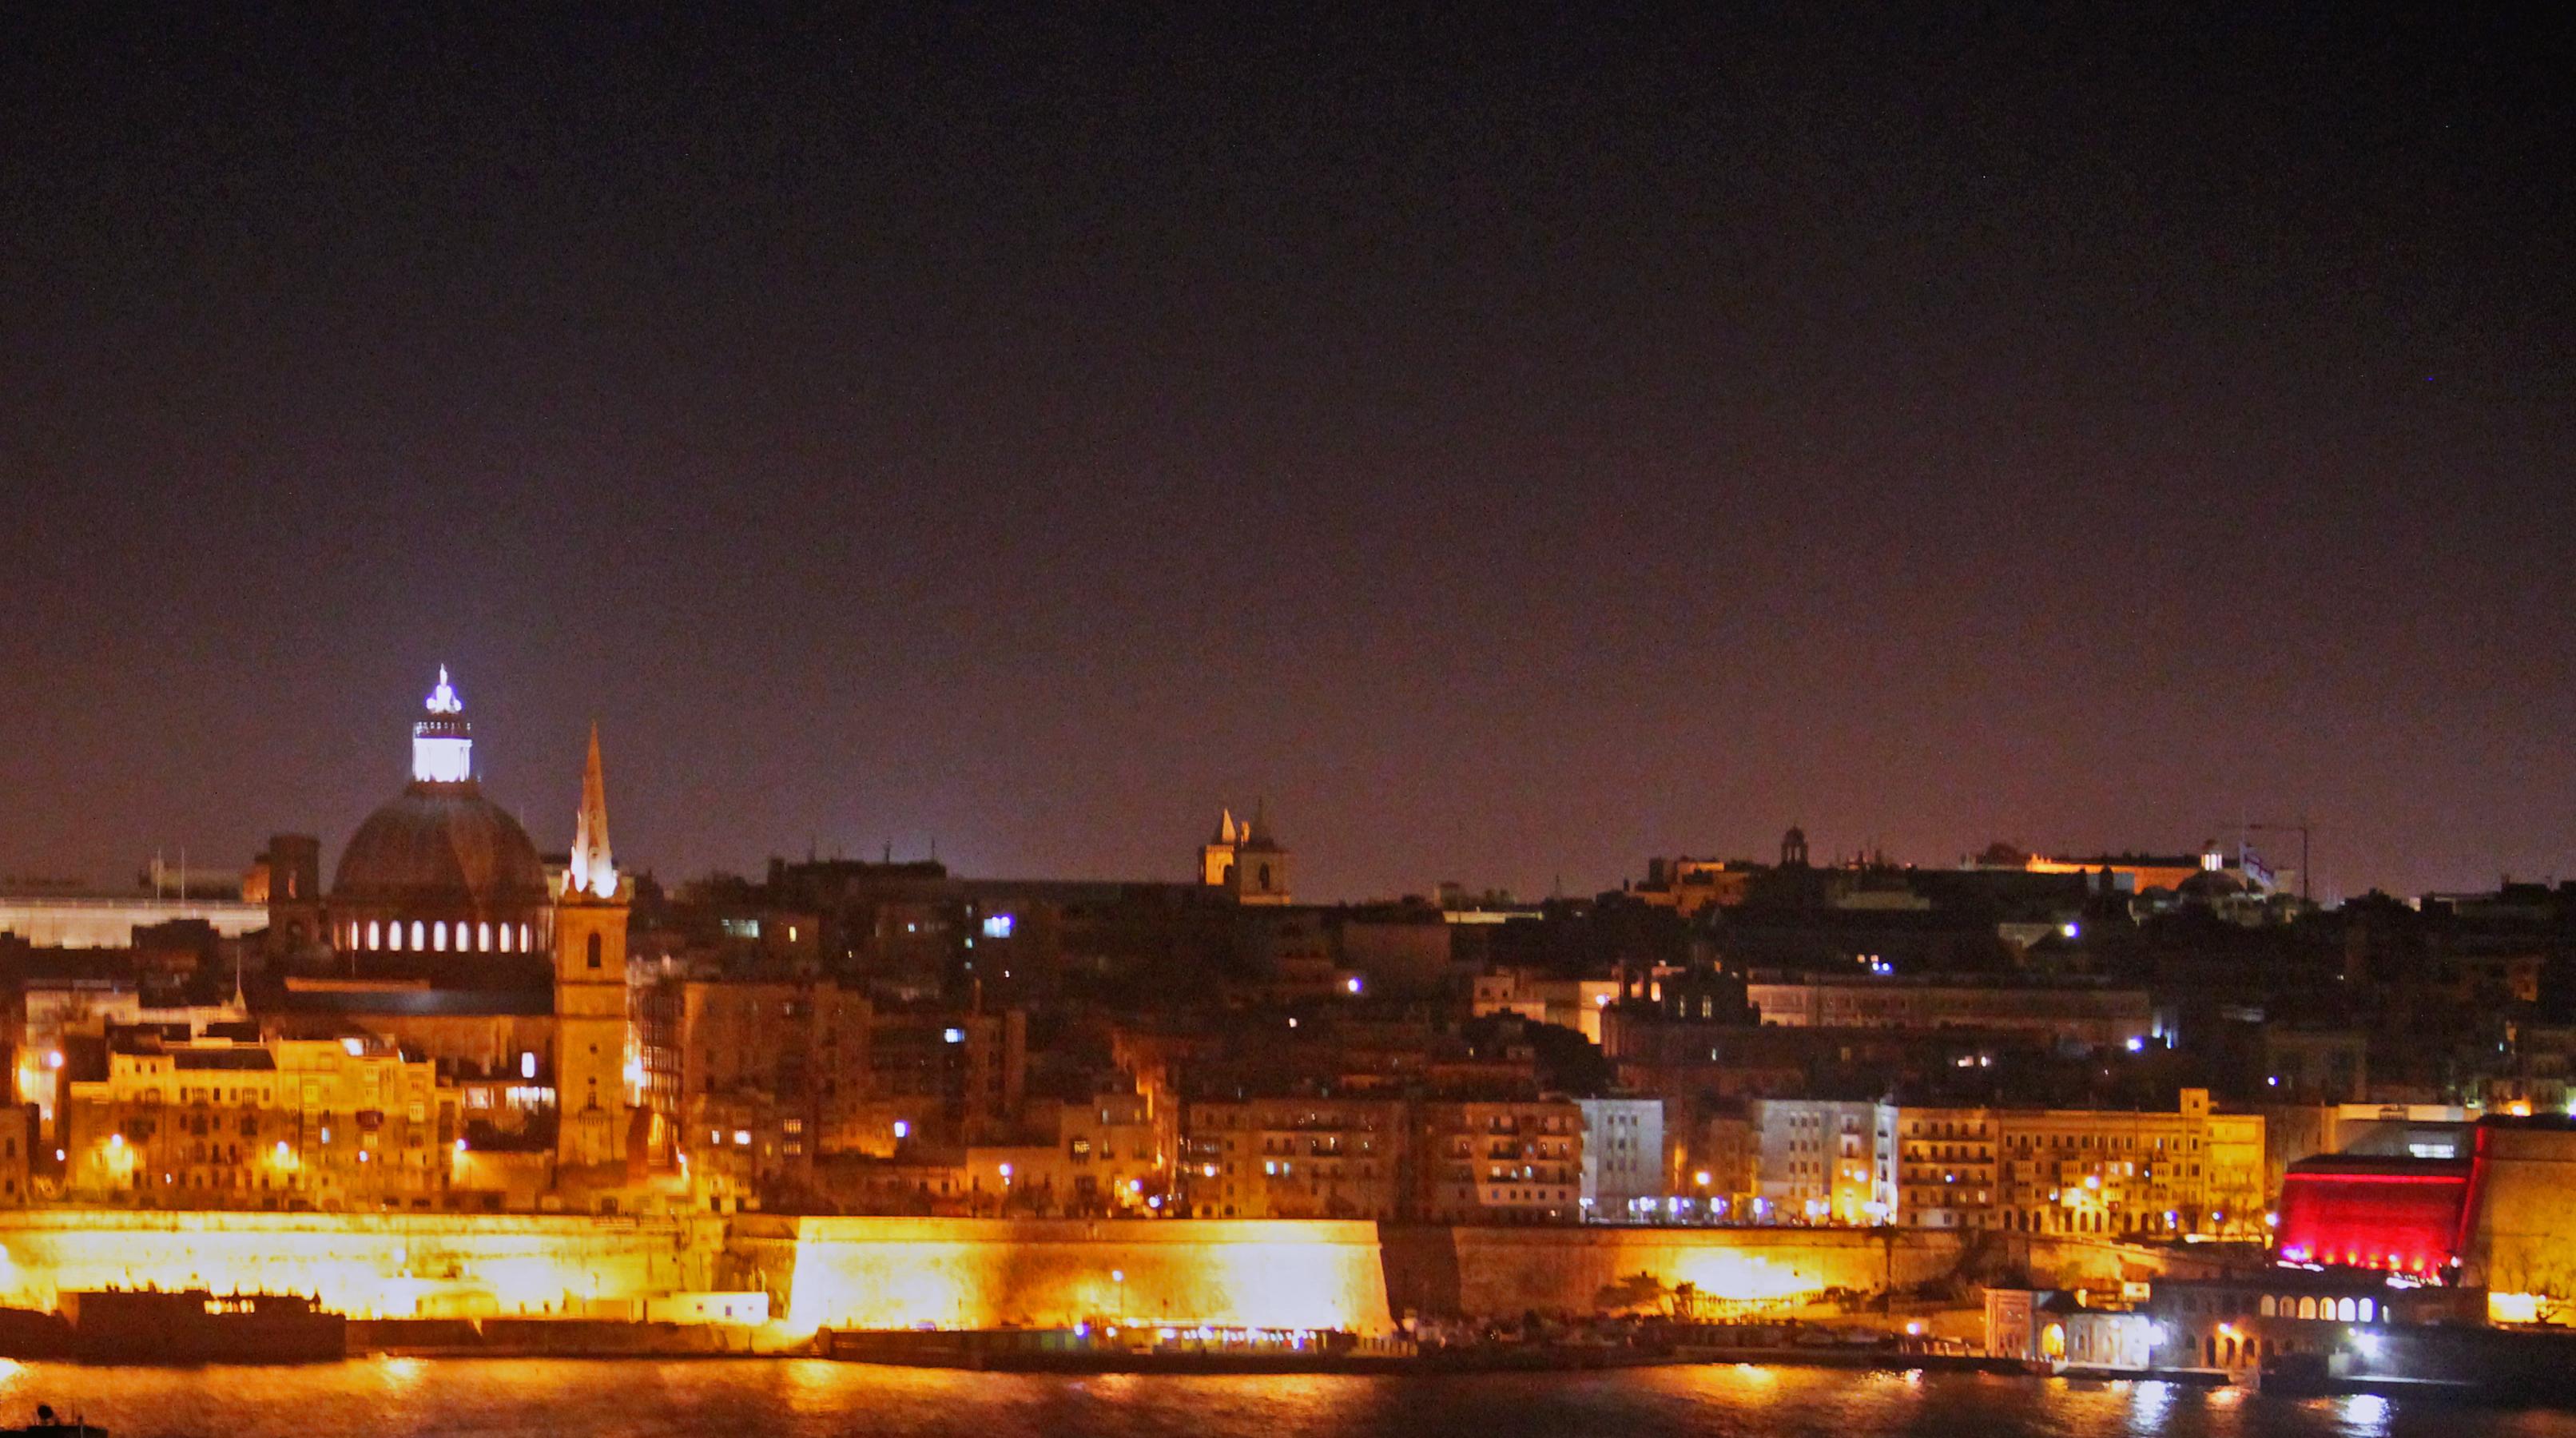 Night tour through Valletta, Mosta and Mdina